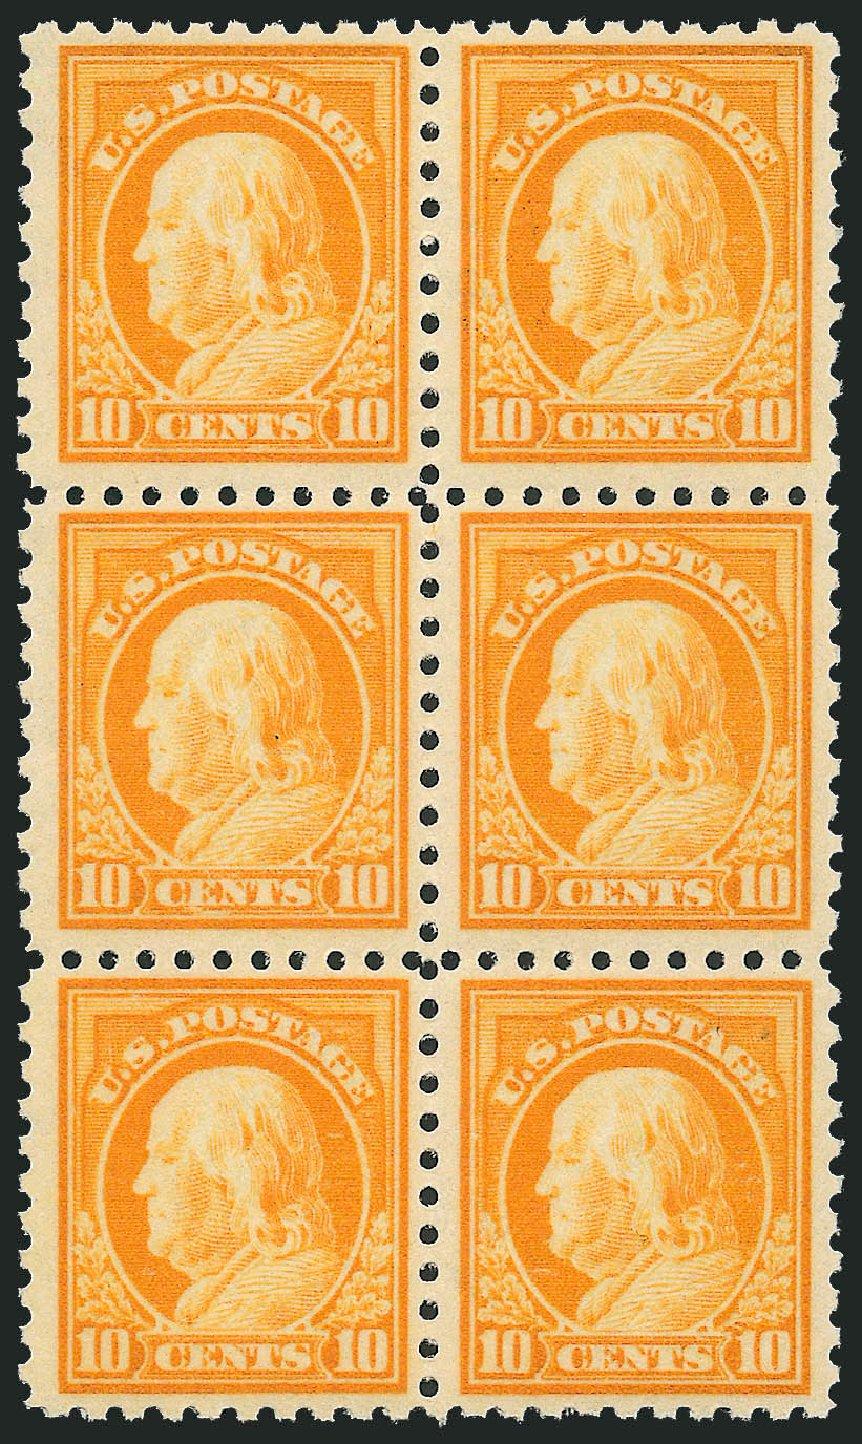 US Stamp Values Scott #433 - 10c 1914 Franklin Perf 10. Robert Siegel Auction Galleries, Mar 2014, Sale 1067, Lot 1523